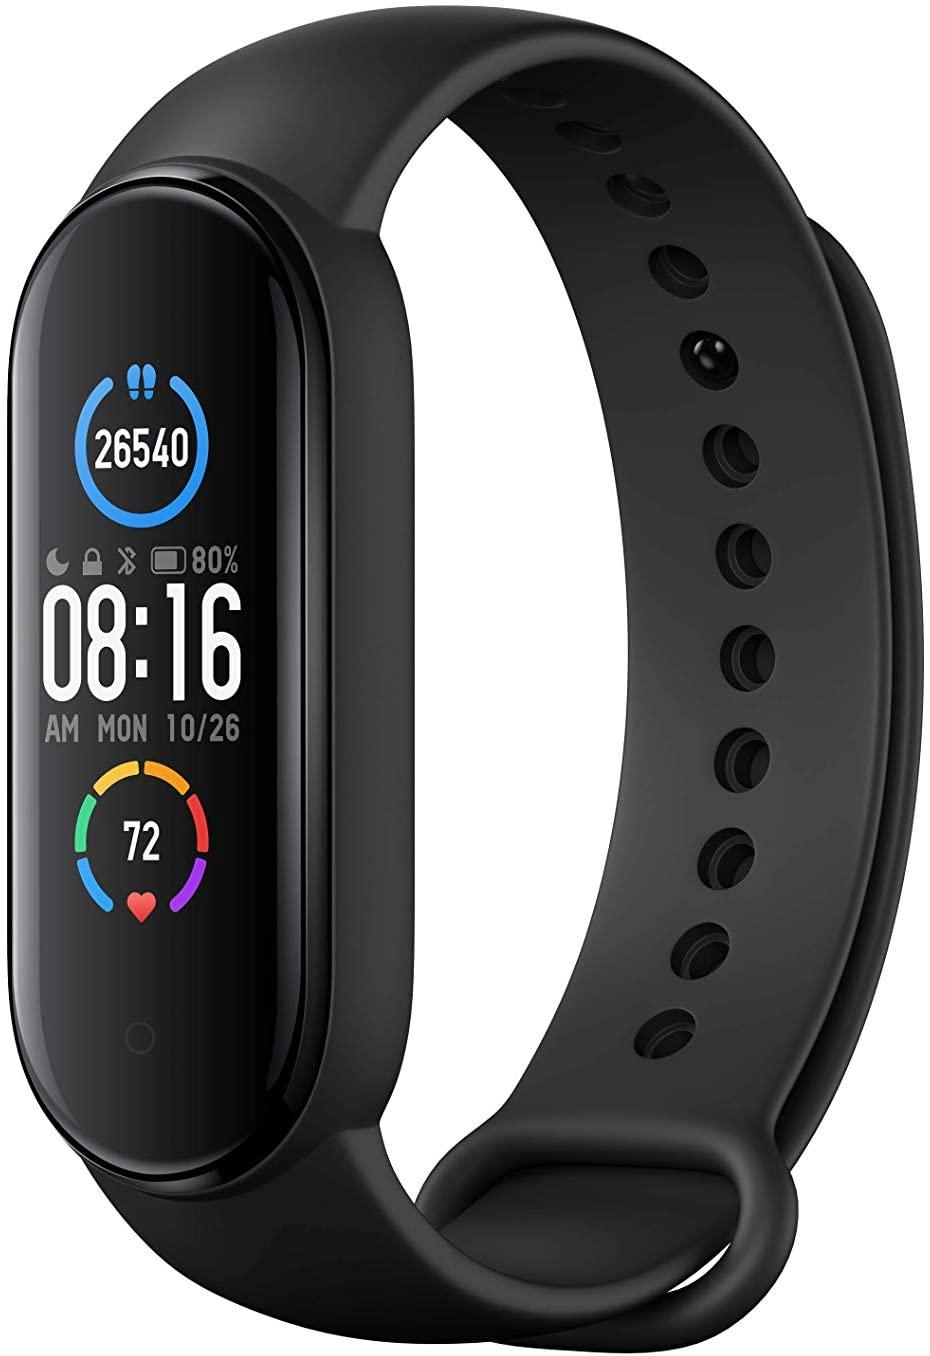 Xiaomi Mi Band 5 (Zwart) - Gezondheid & Fitness Tracker @Amazon.nl